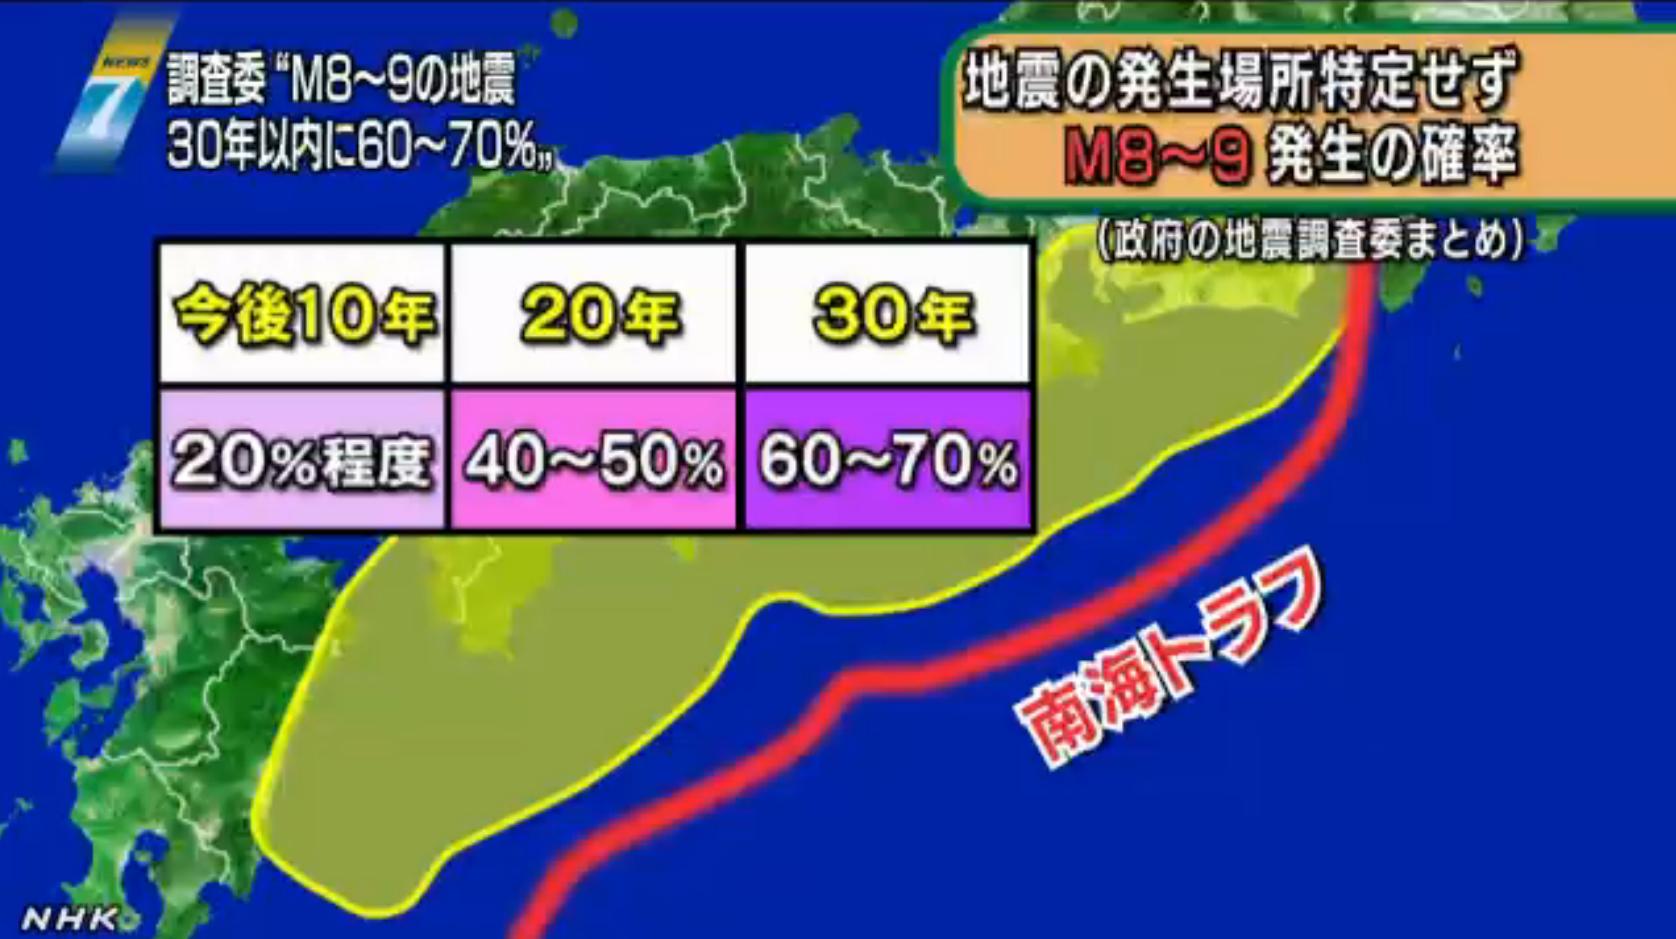 nannkaitorahu kakuritu.jpg - 【南海地震予測】他の震災との関連性と発生時期。気になる被害規模は?